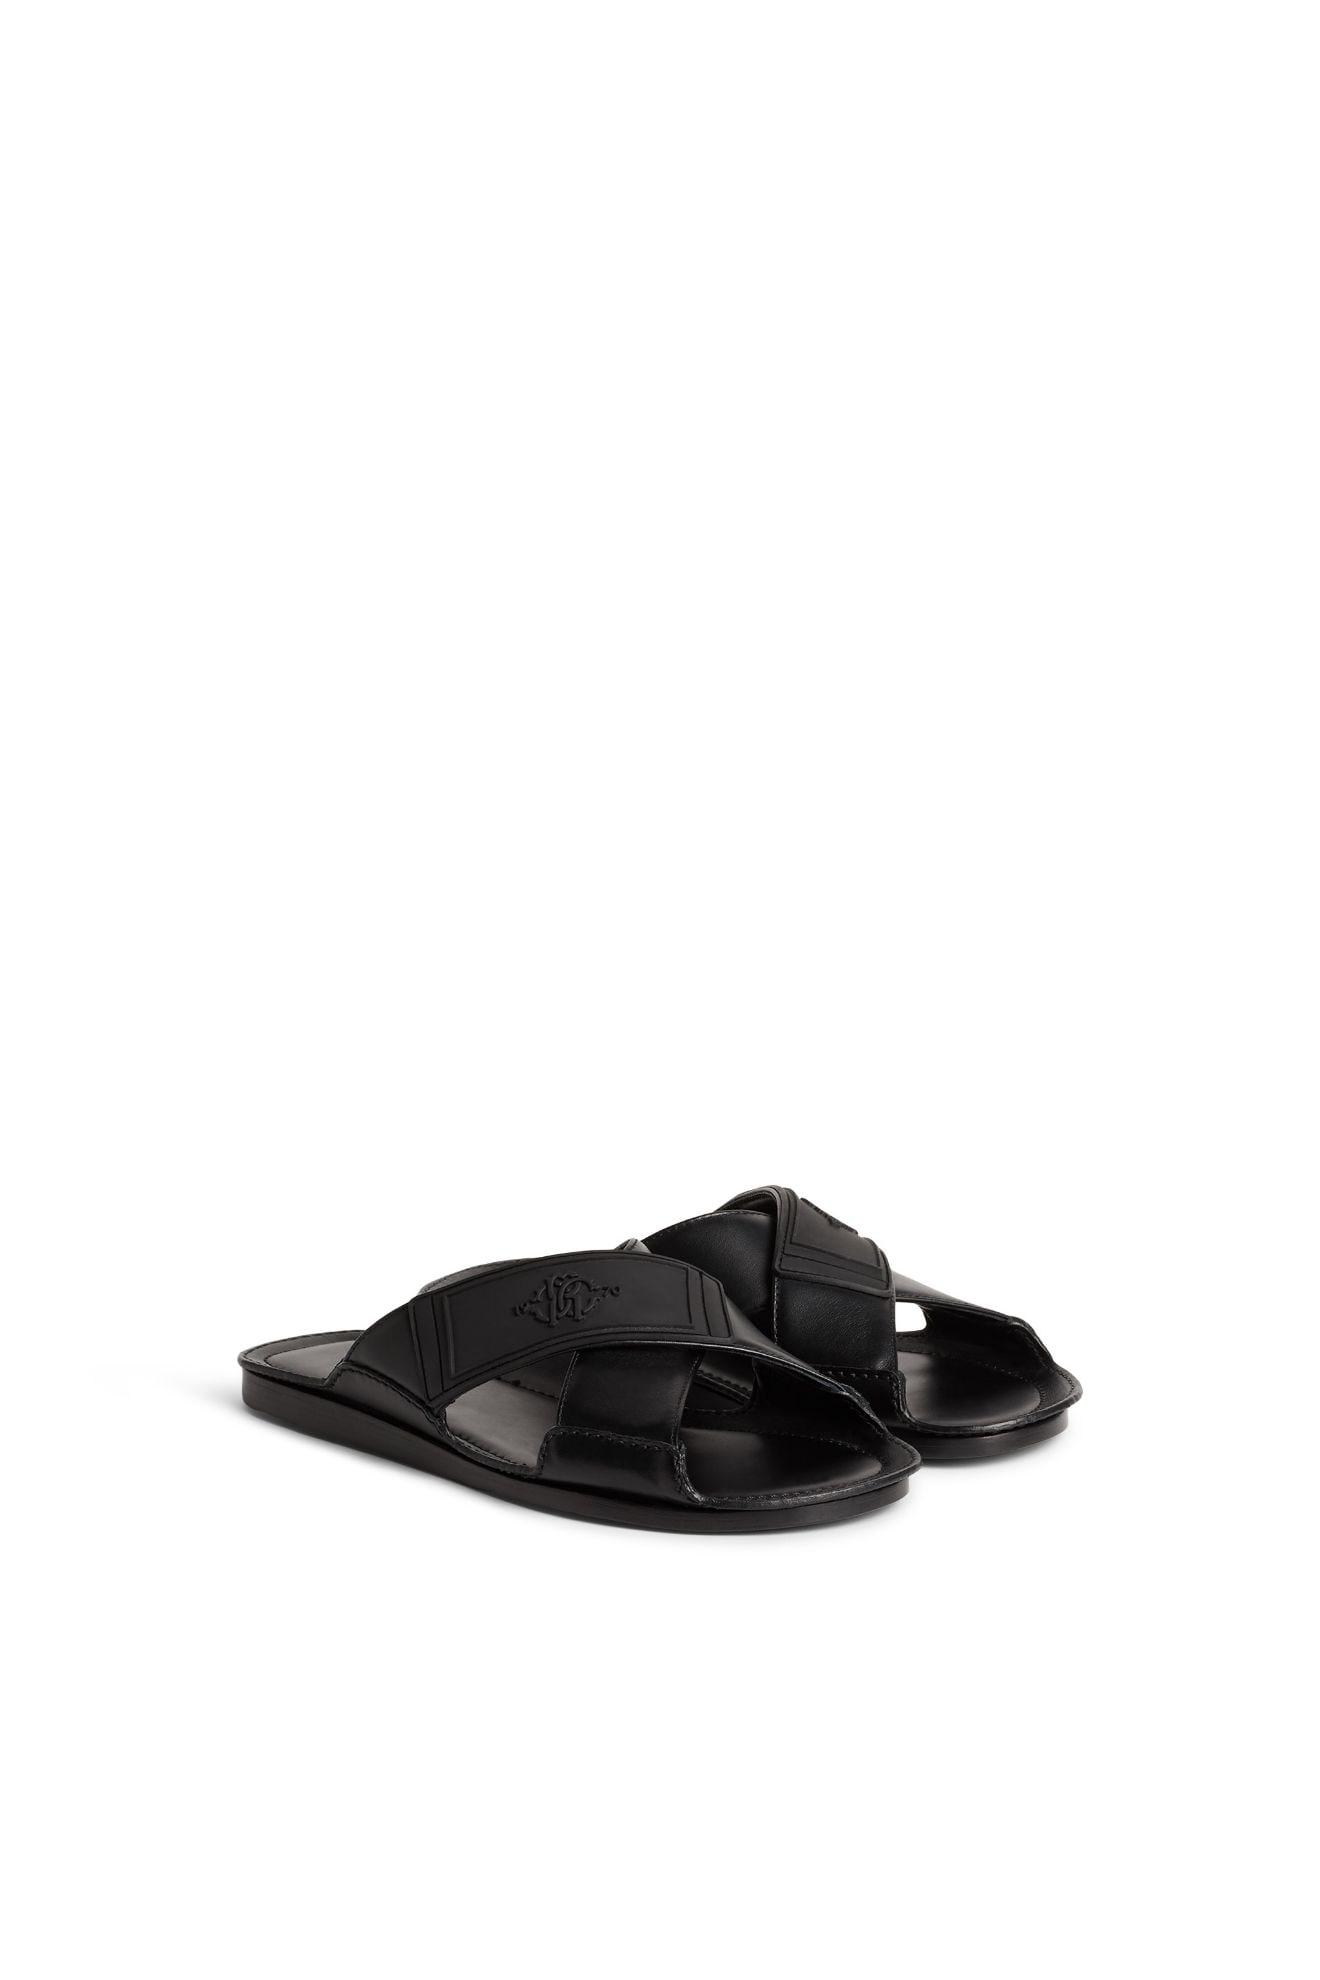 crossover sandaler